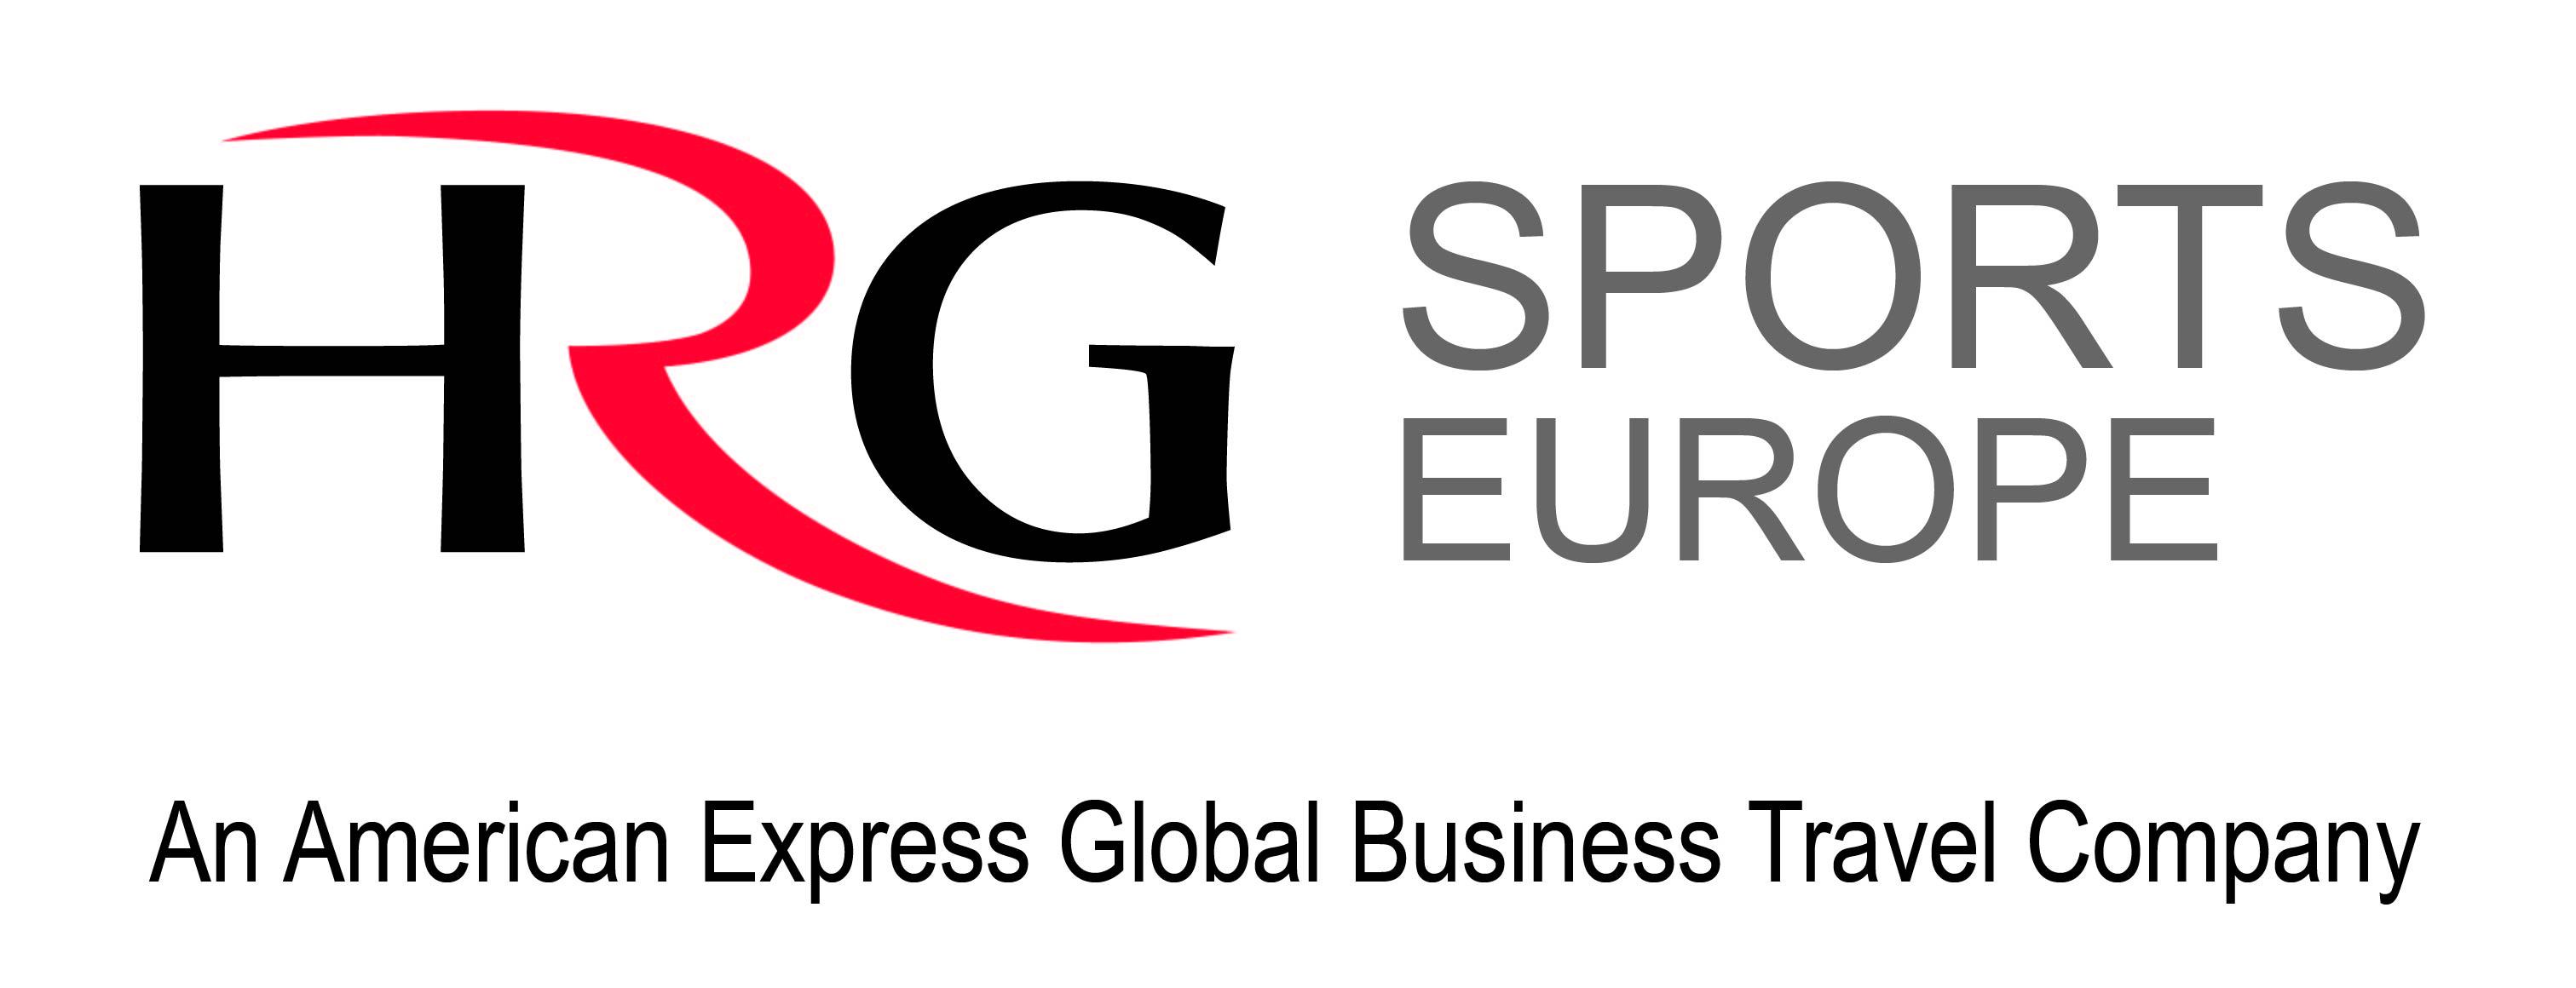 HRG Sports Europe